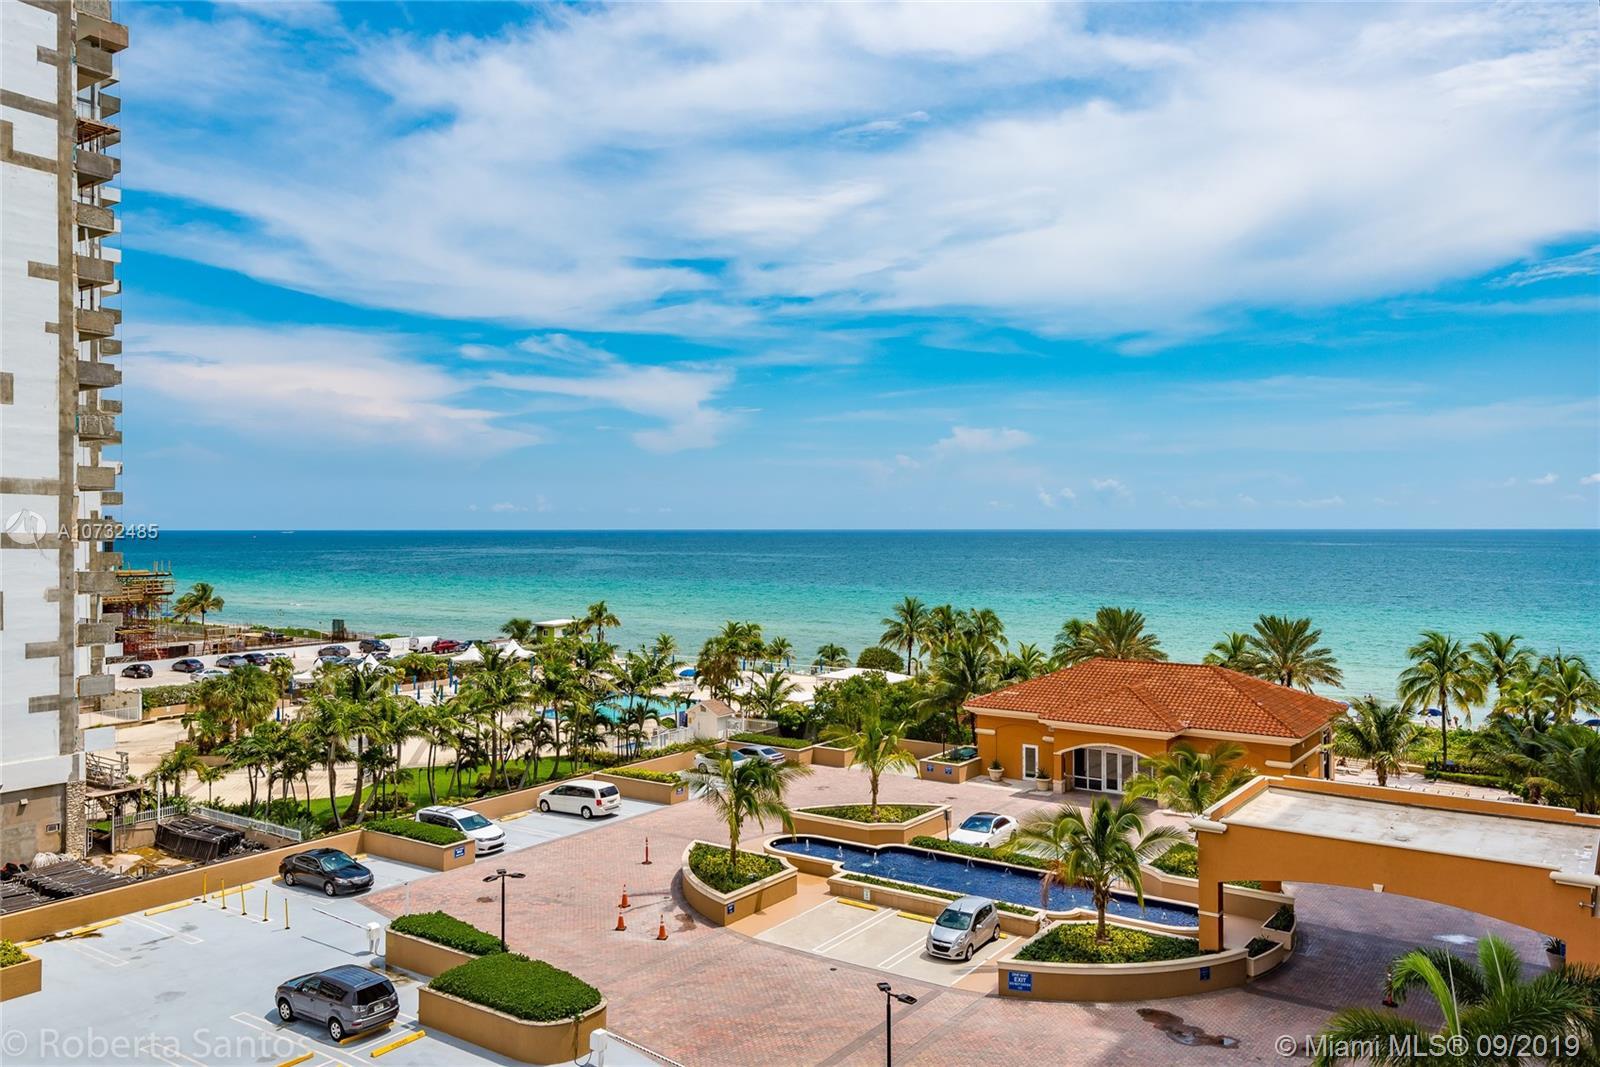 2080 Hallandale #602 - 2080 S Ocean DR #602, Hallandale Beach, FL 33009